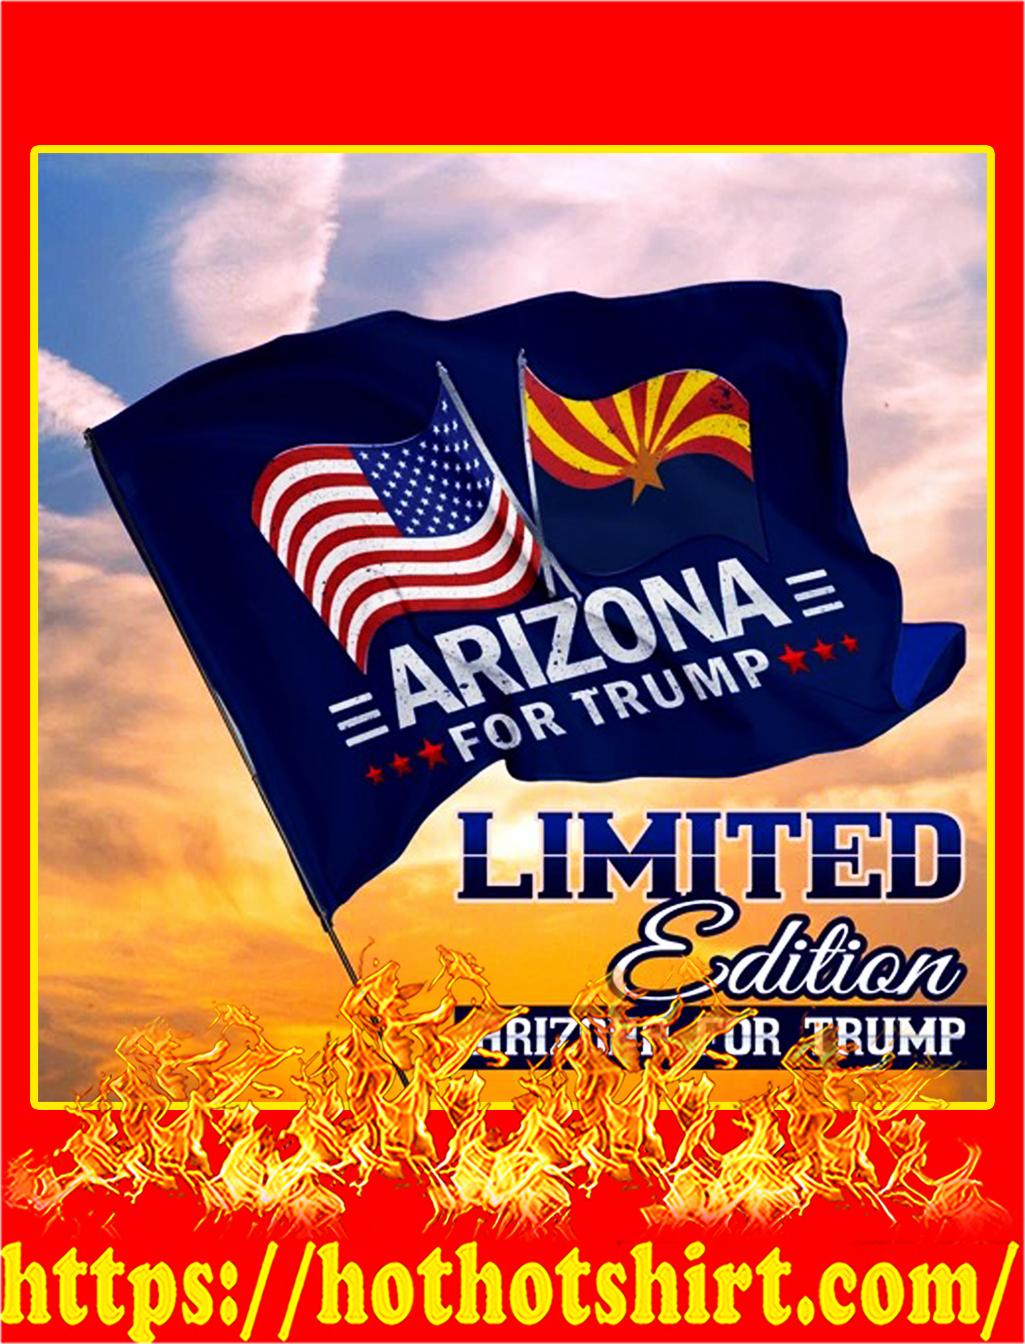 Arizona for trump flag - pic 1